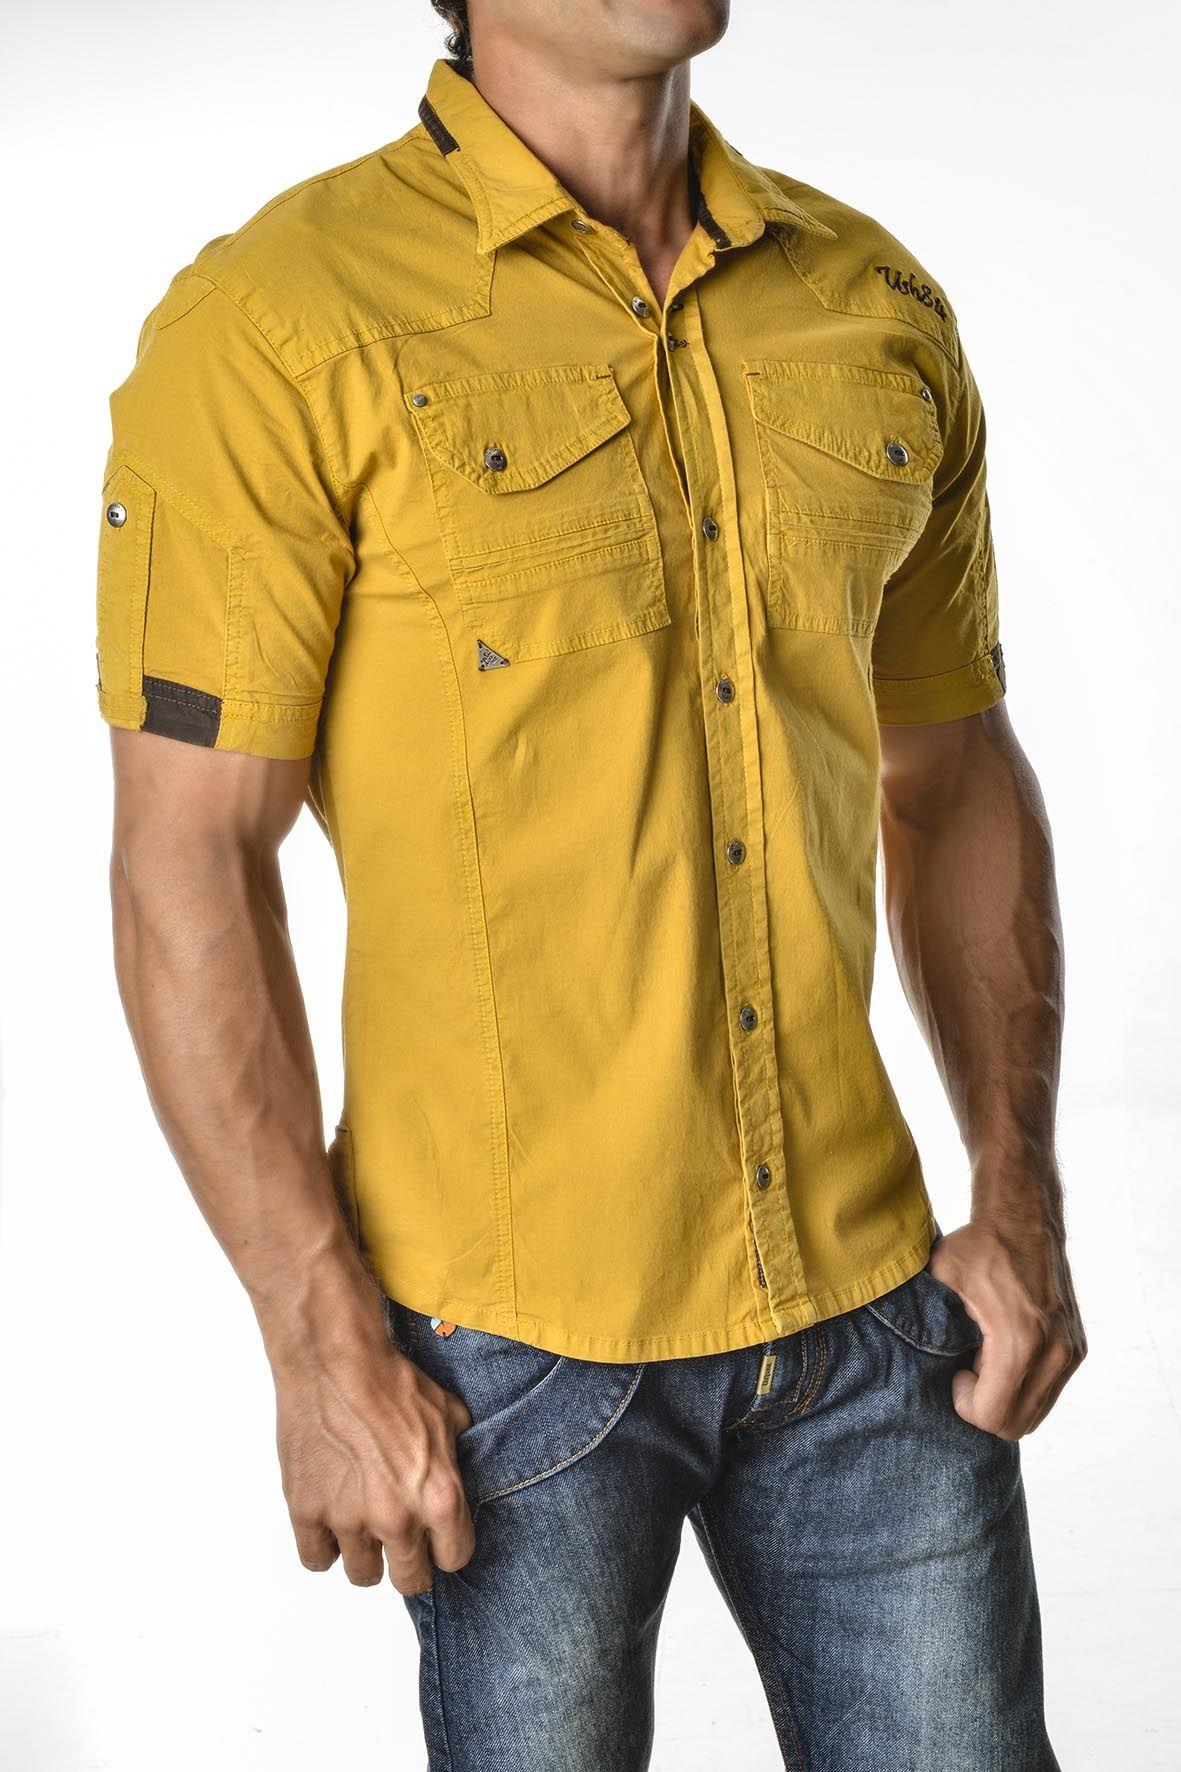 Pin On Camisa Hombre Mens Shirt Moda Y Fashion